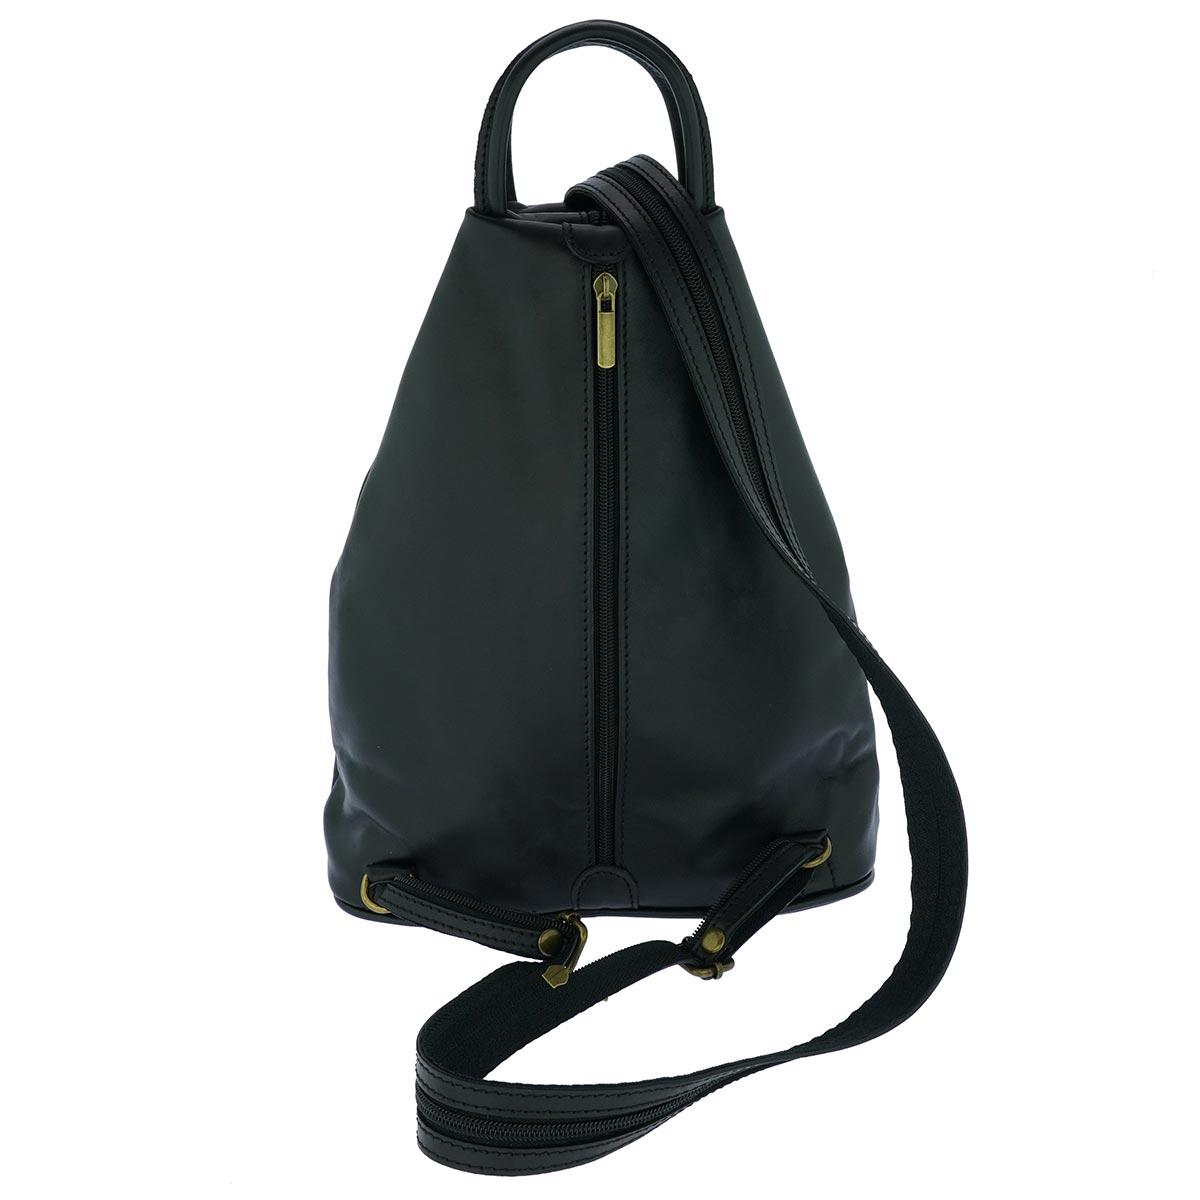 Fioretta Italian Genuine Leather Top Handle Backpack Purse Shoulder Bag Handbag Rucksack For Women - Black